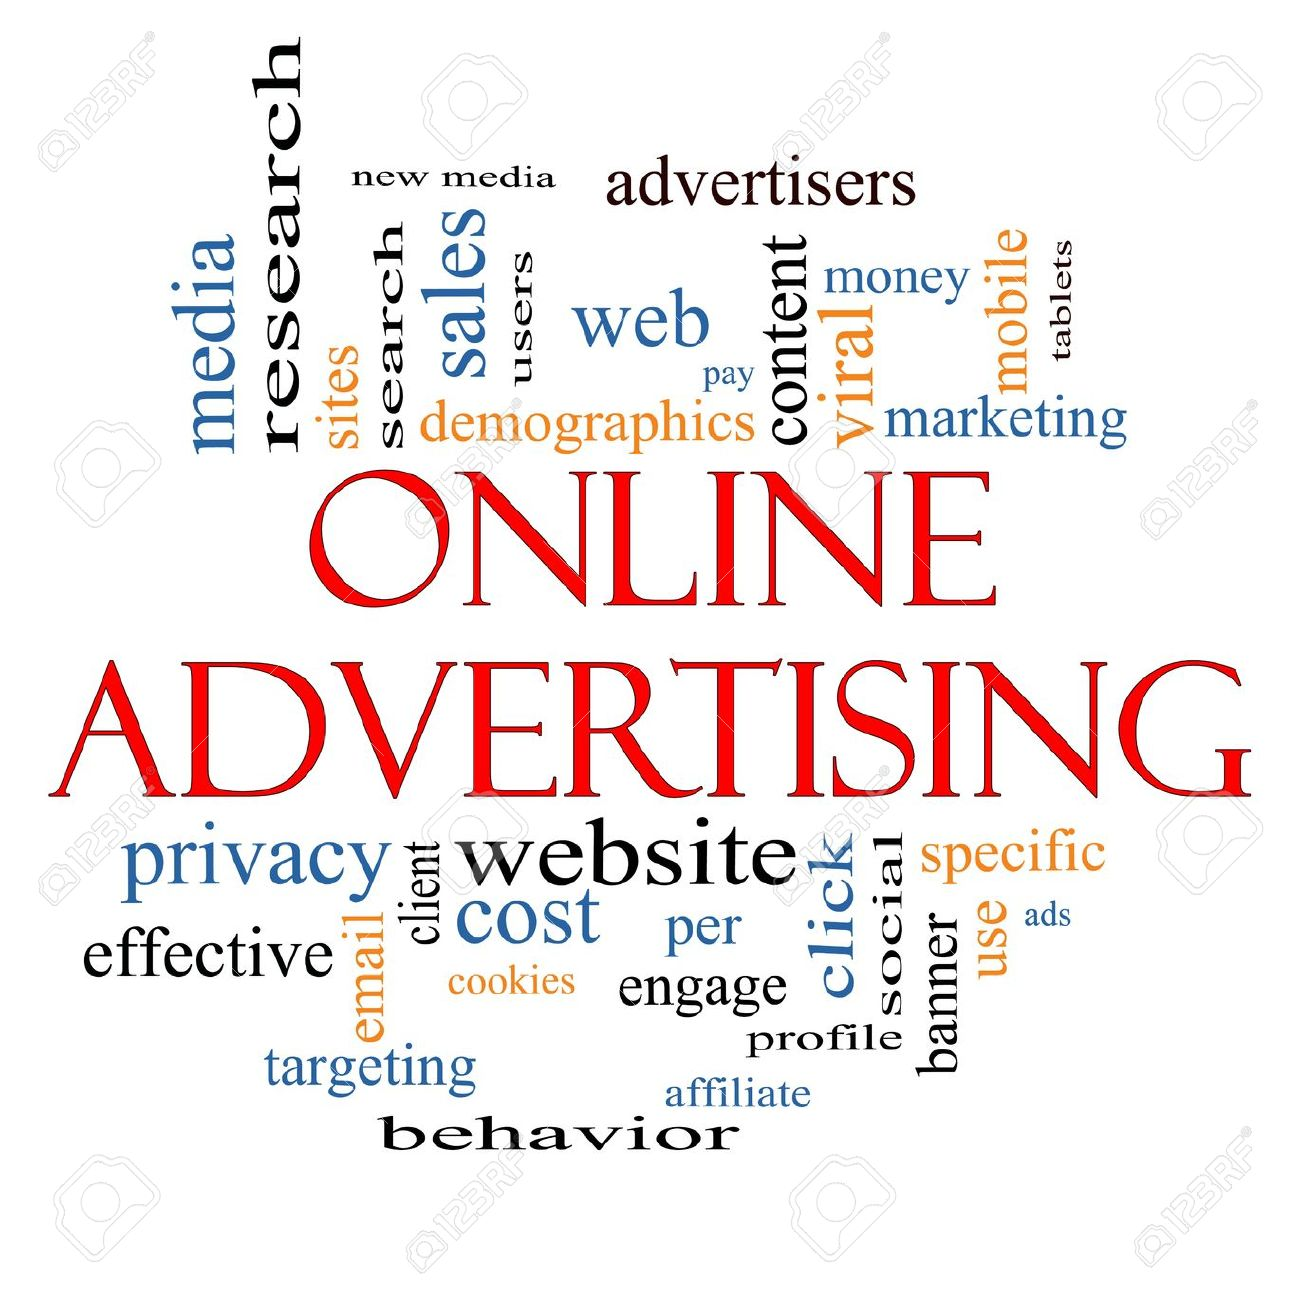 online_advertising_benefits.jpg